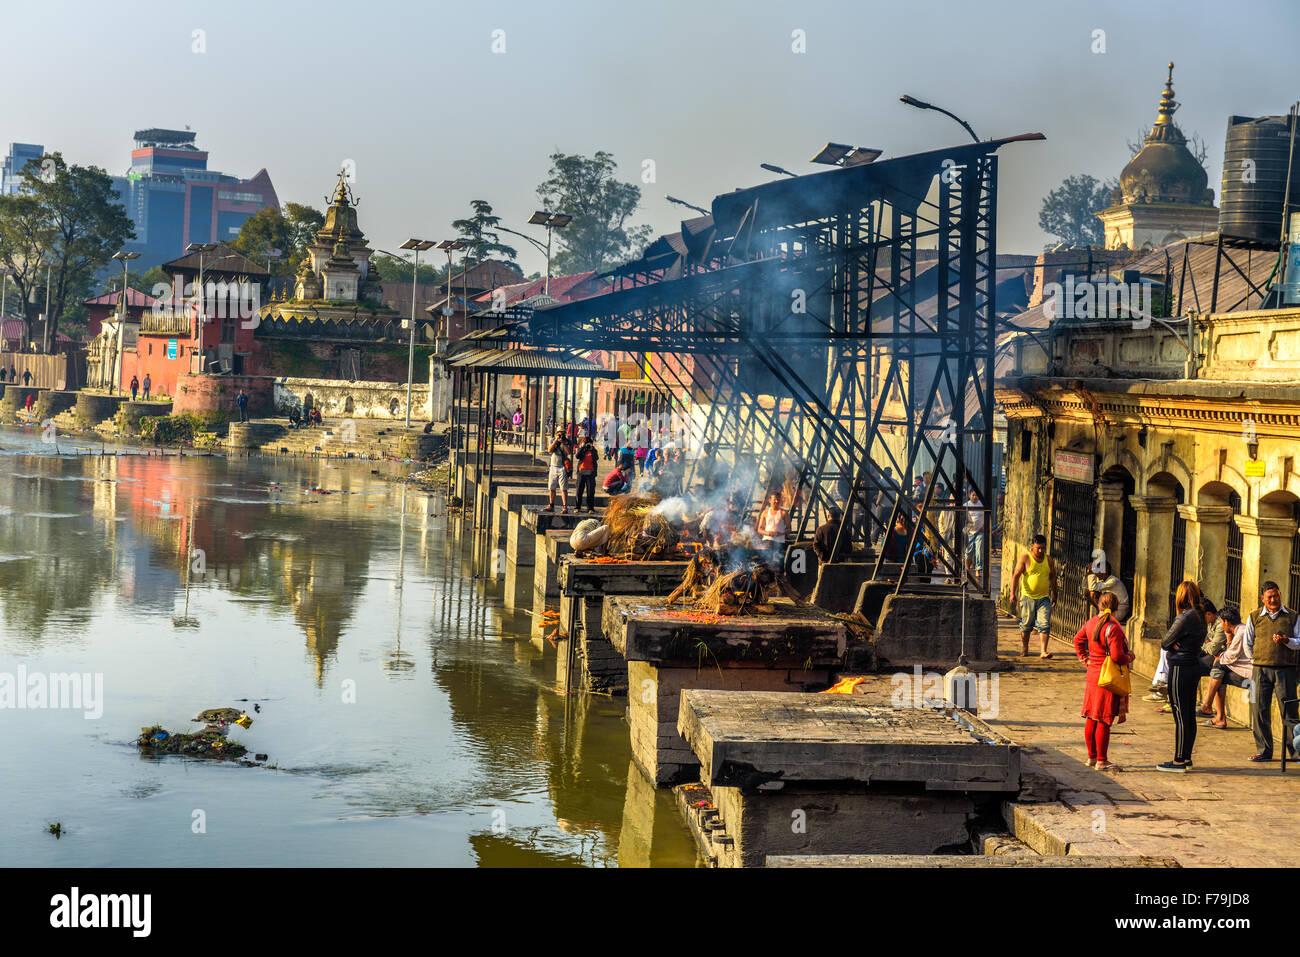 Hindu cremation rituals  at the banks of Bagmati river at Pashupatinath Temple complex in Kathmandu - Stock Image